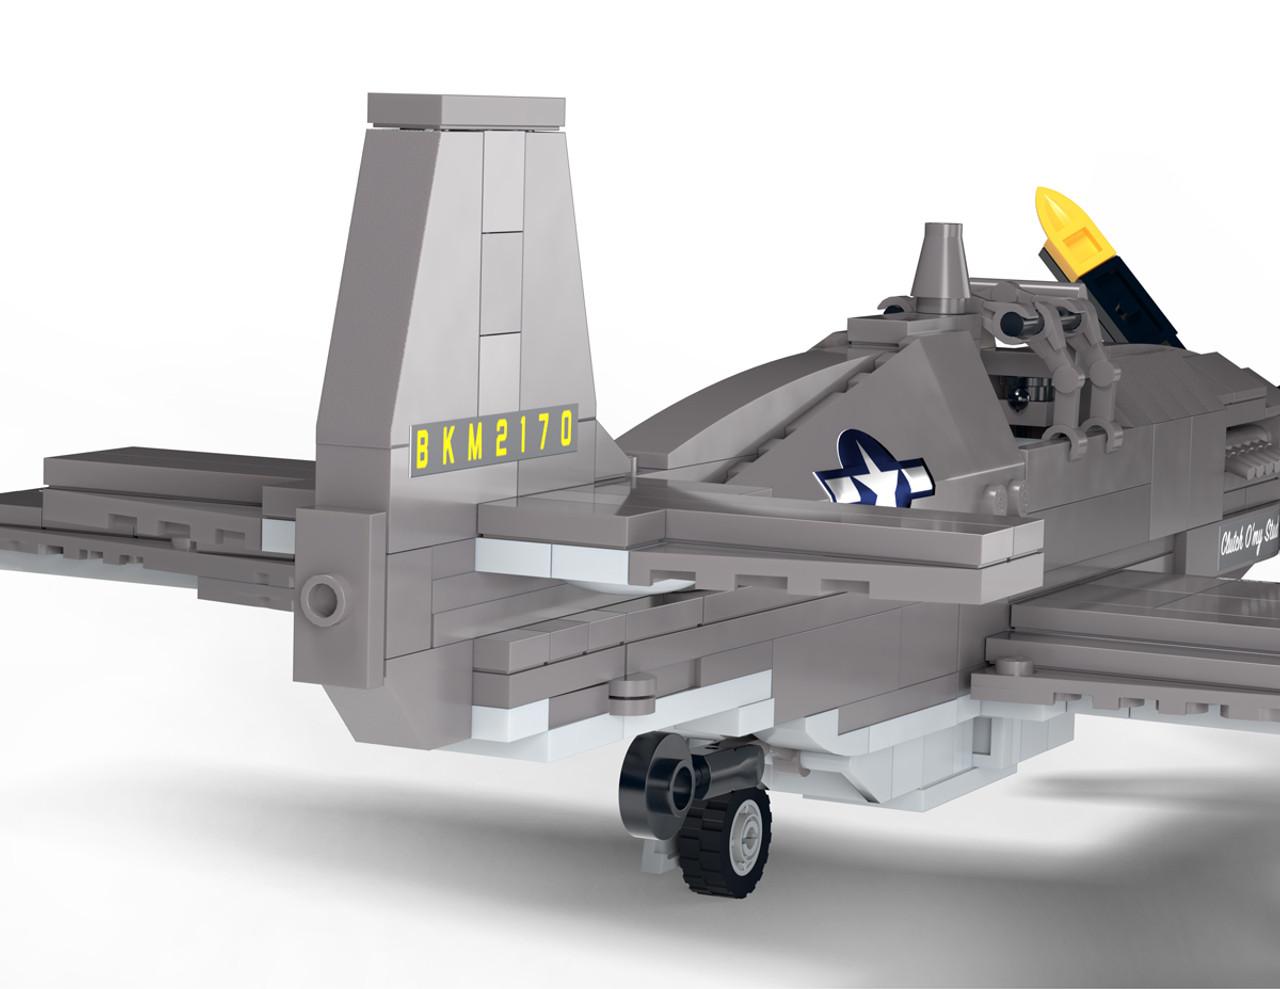 P-51B Mustang - Long-Range Bomber Escort